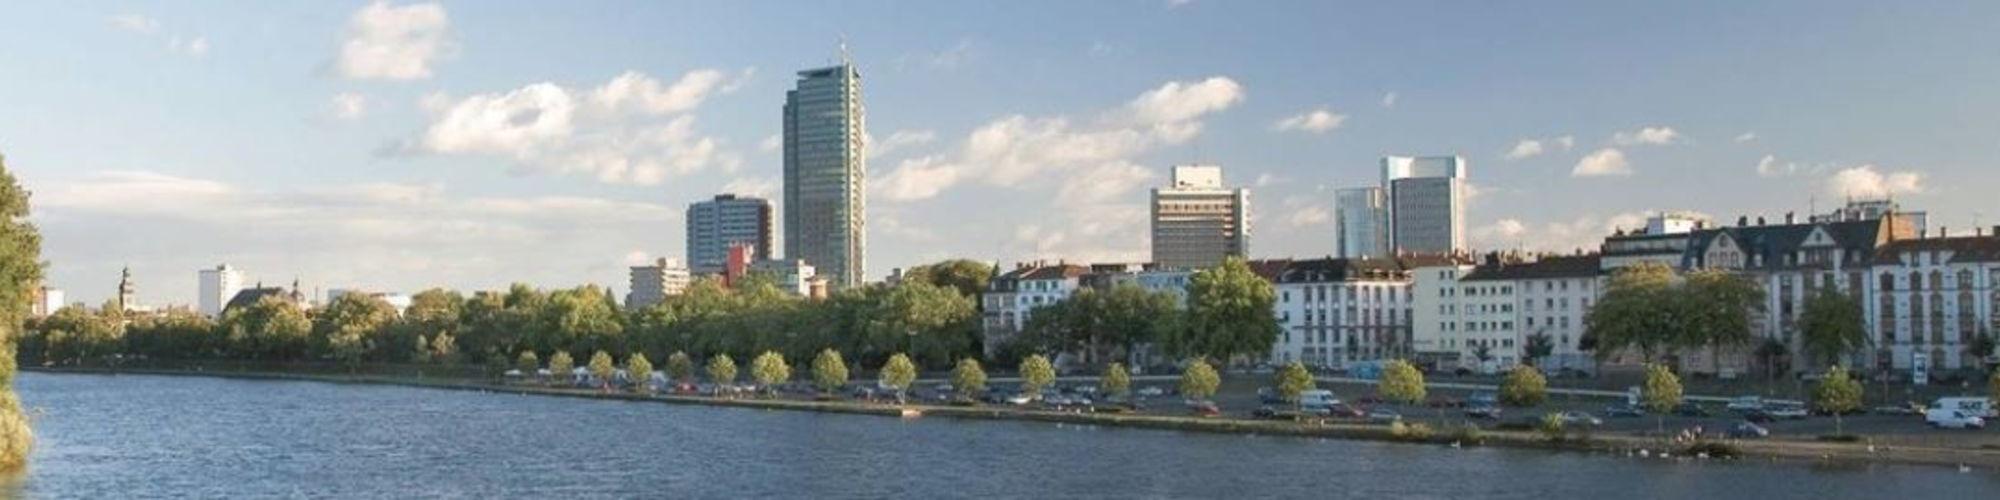 Stadtwerke Offenbach